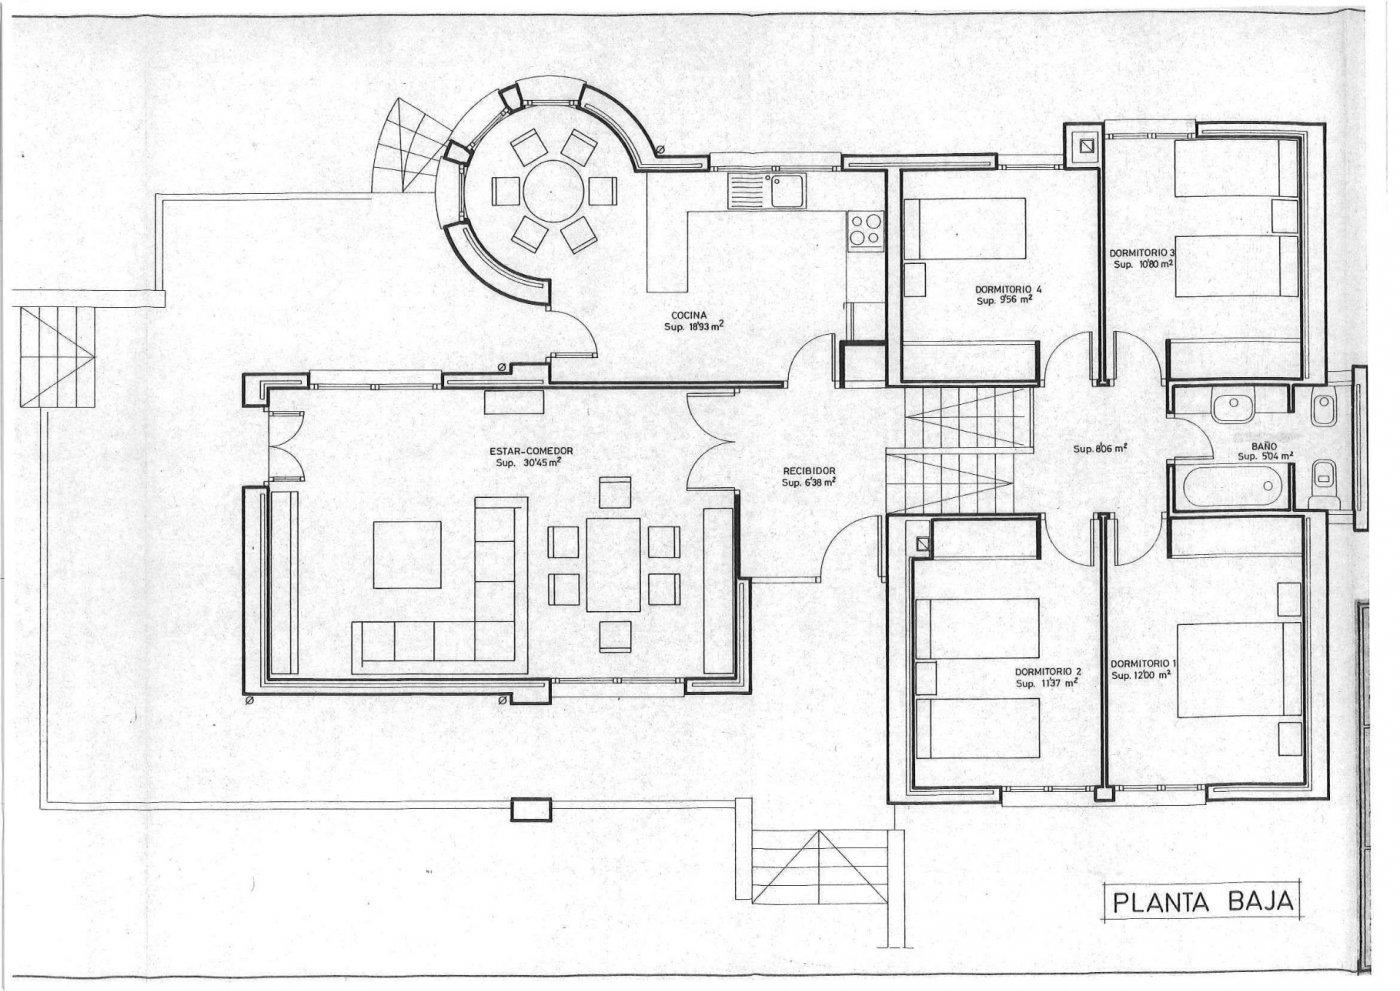 Parcela lateral de 600m2 con casa de 267m2 útiles  de vivienda mas garaje anejo de 45m2 út - imagenInmueble33